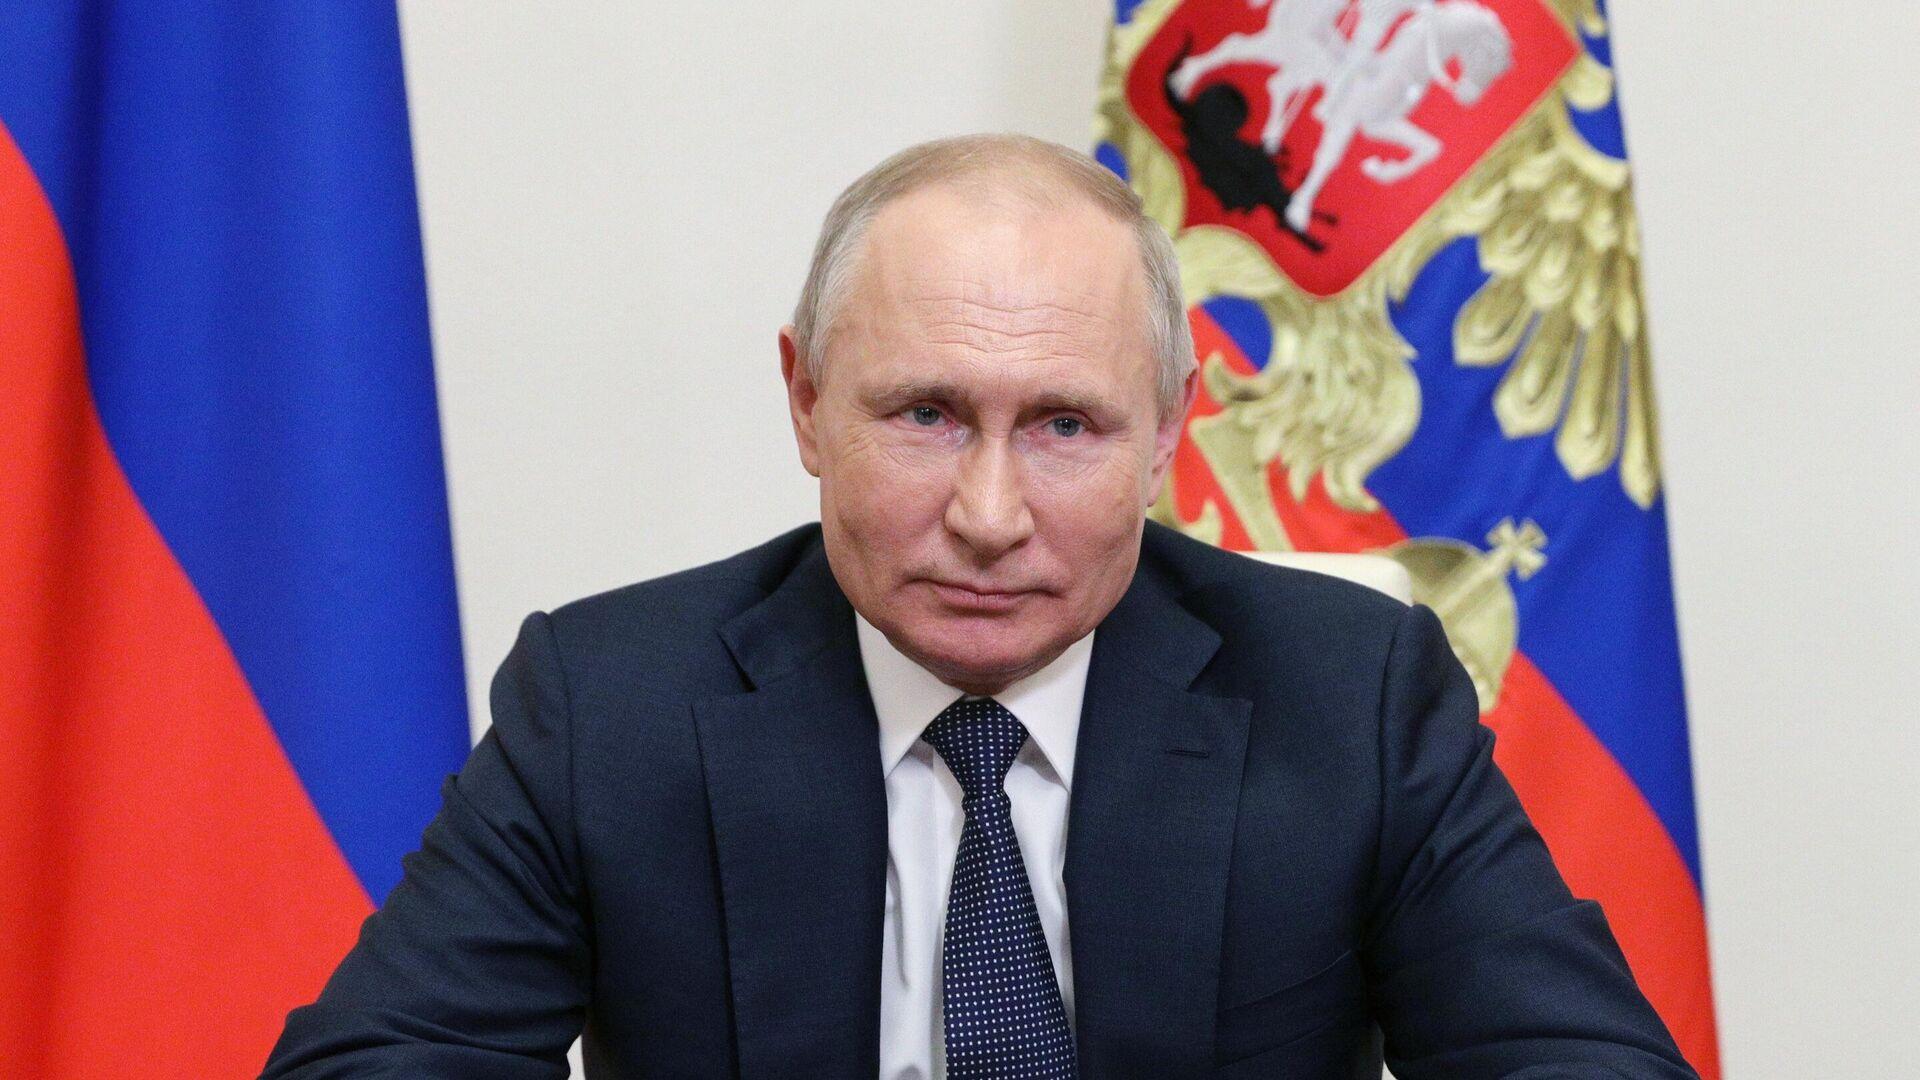 Президент РФ Владимир Путин - РИА Новости, 1920, 14.06.2021